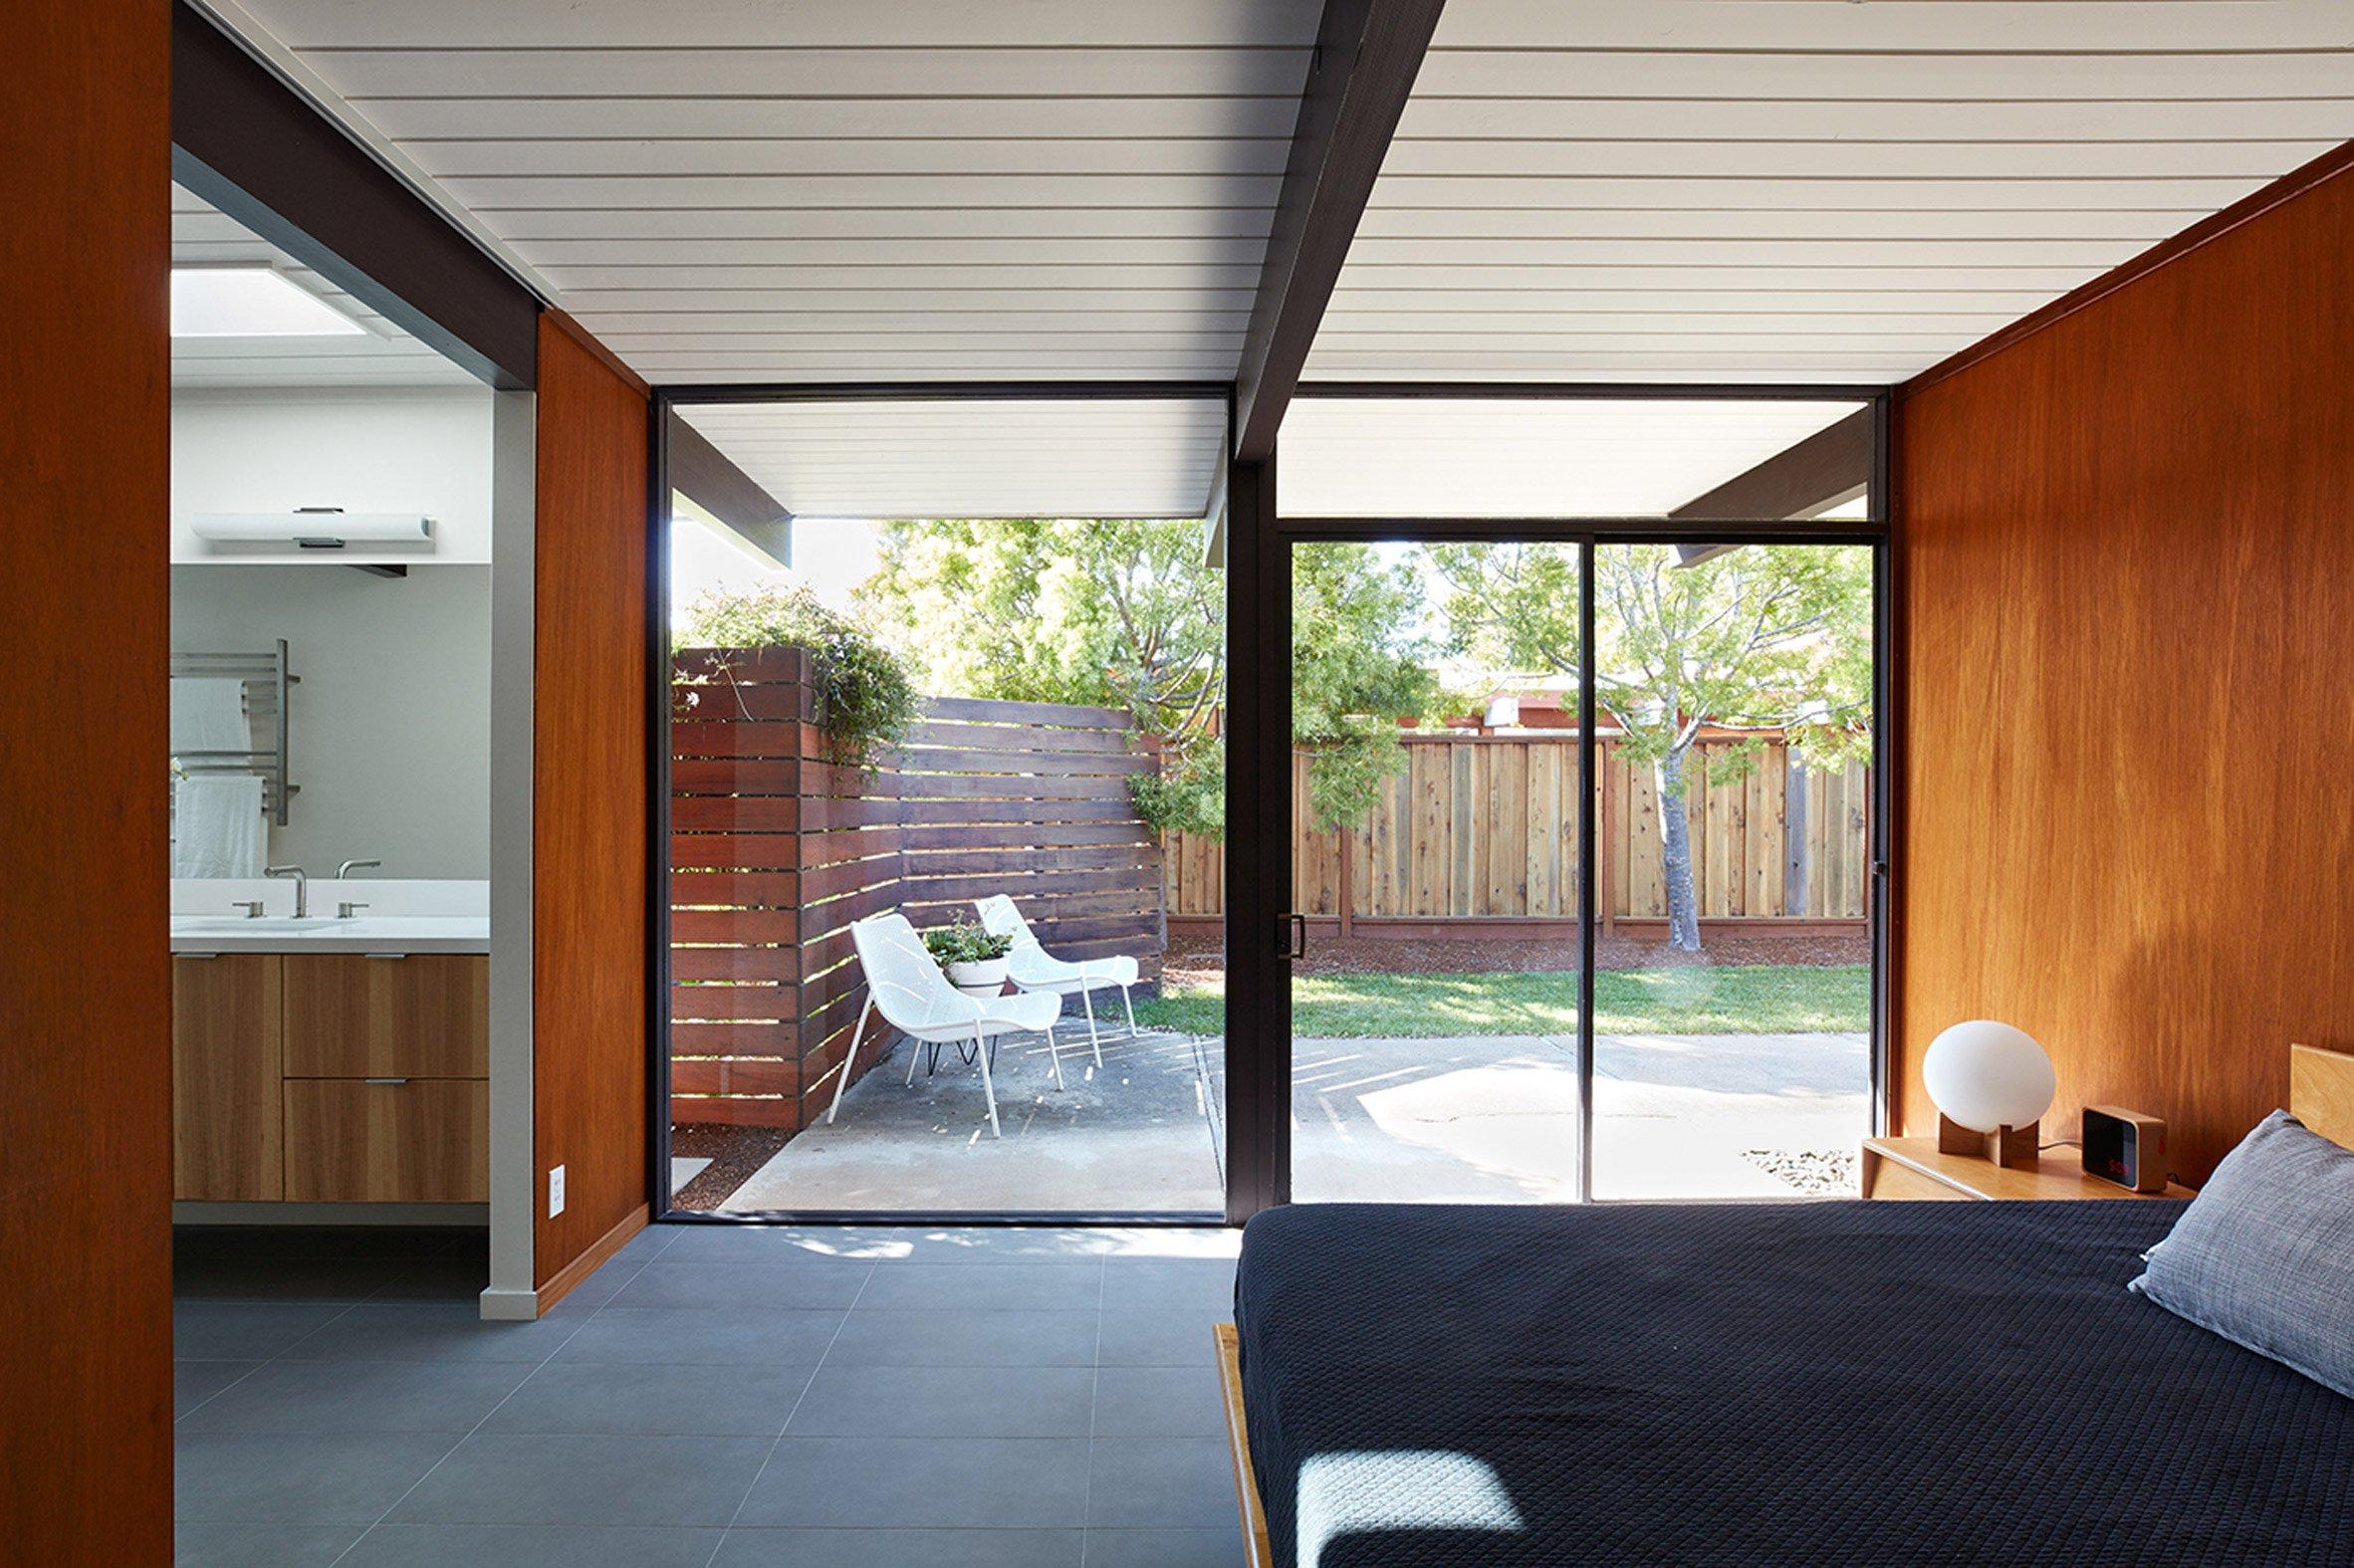 San Mateo Eichler Addition Remodel by Klopf Architecture